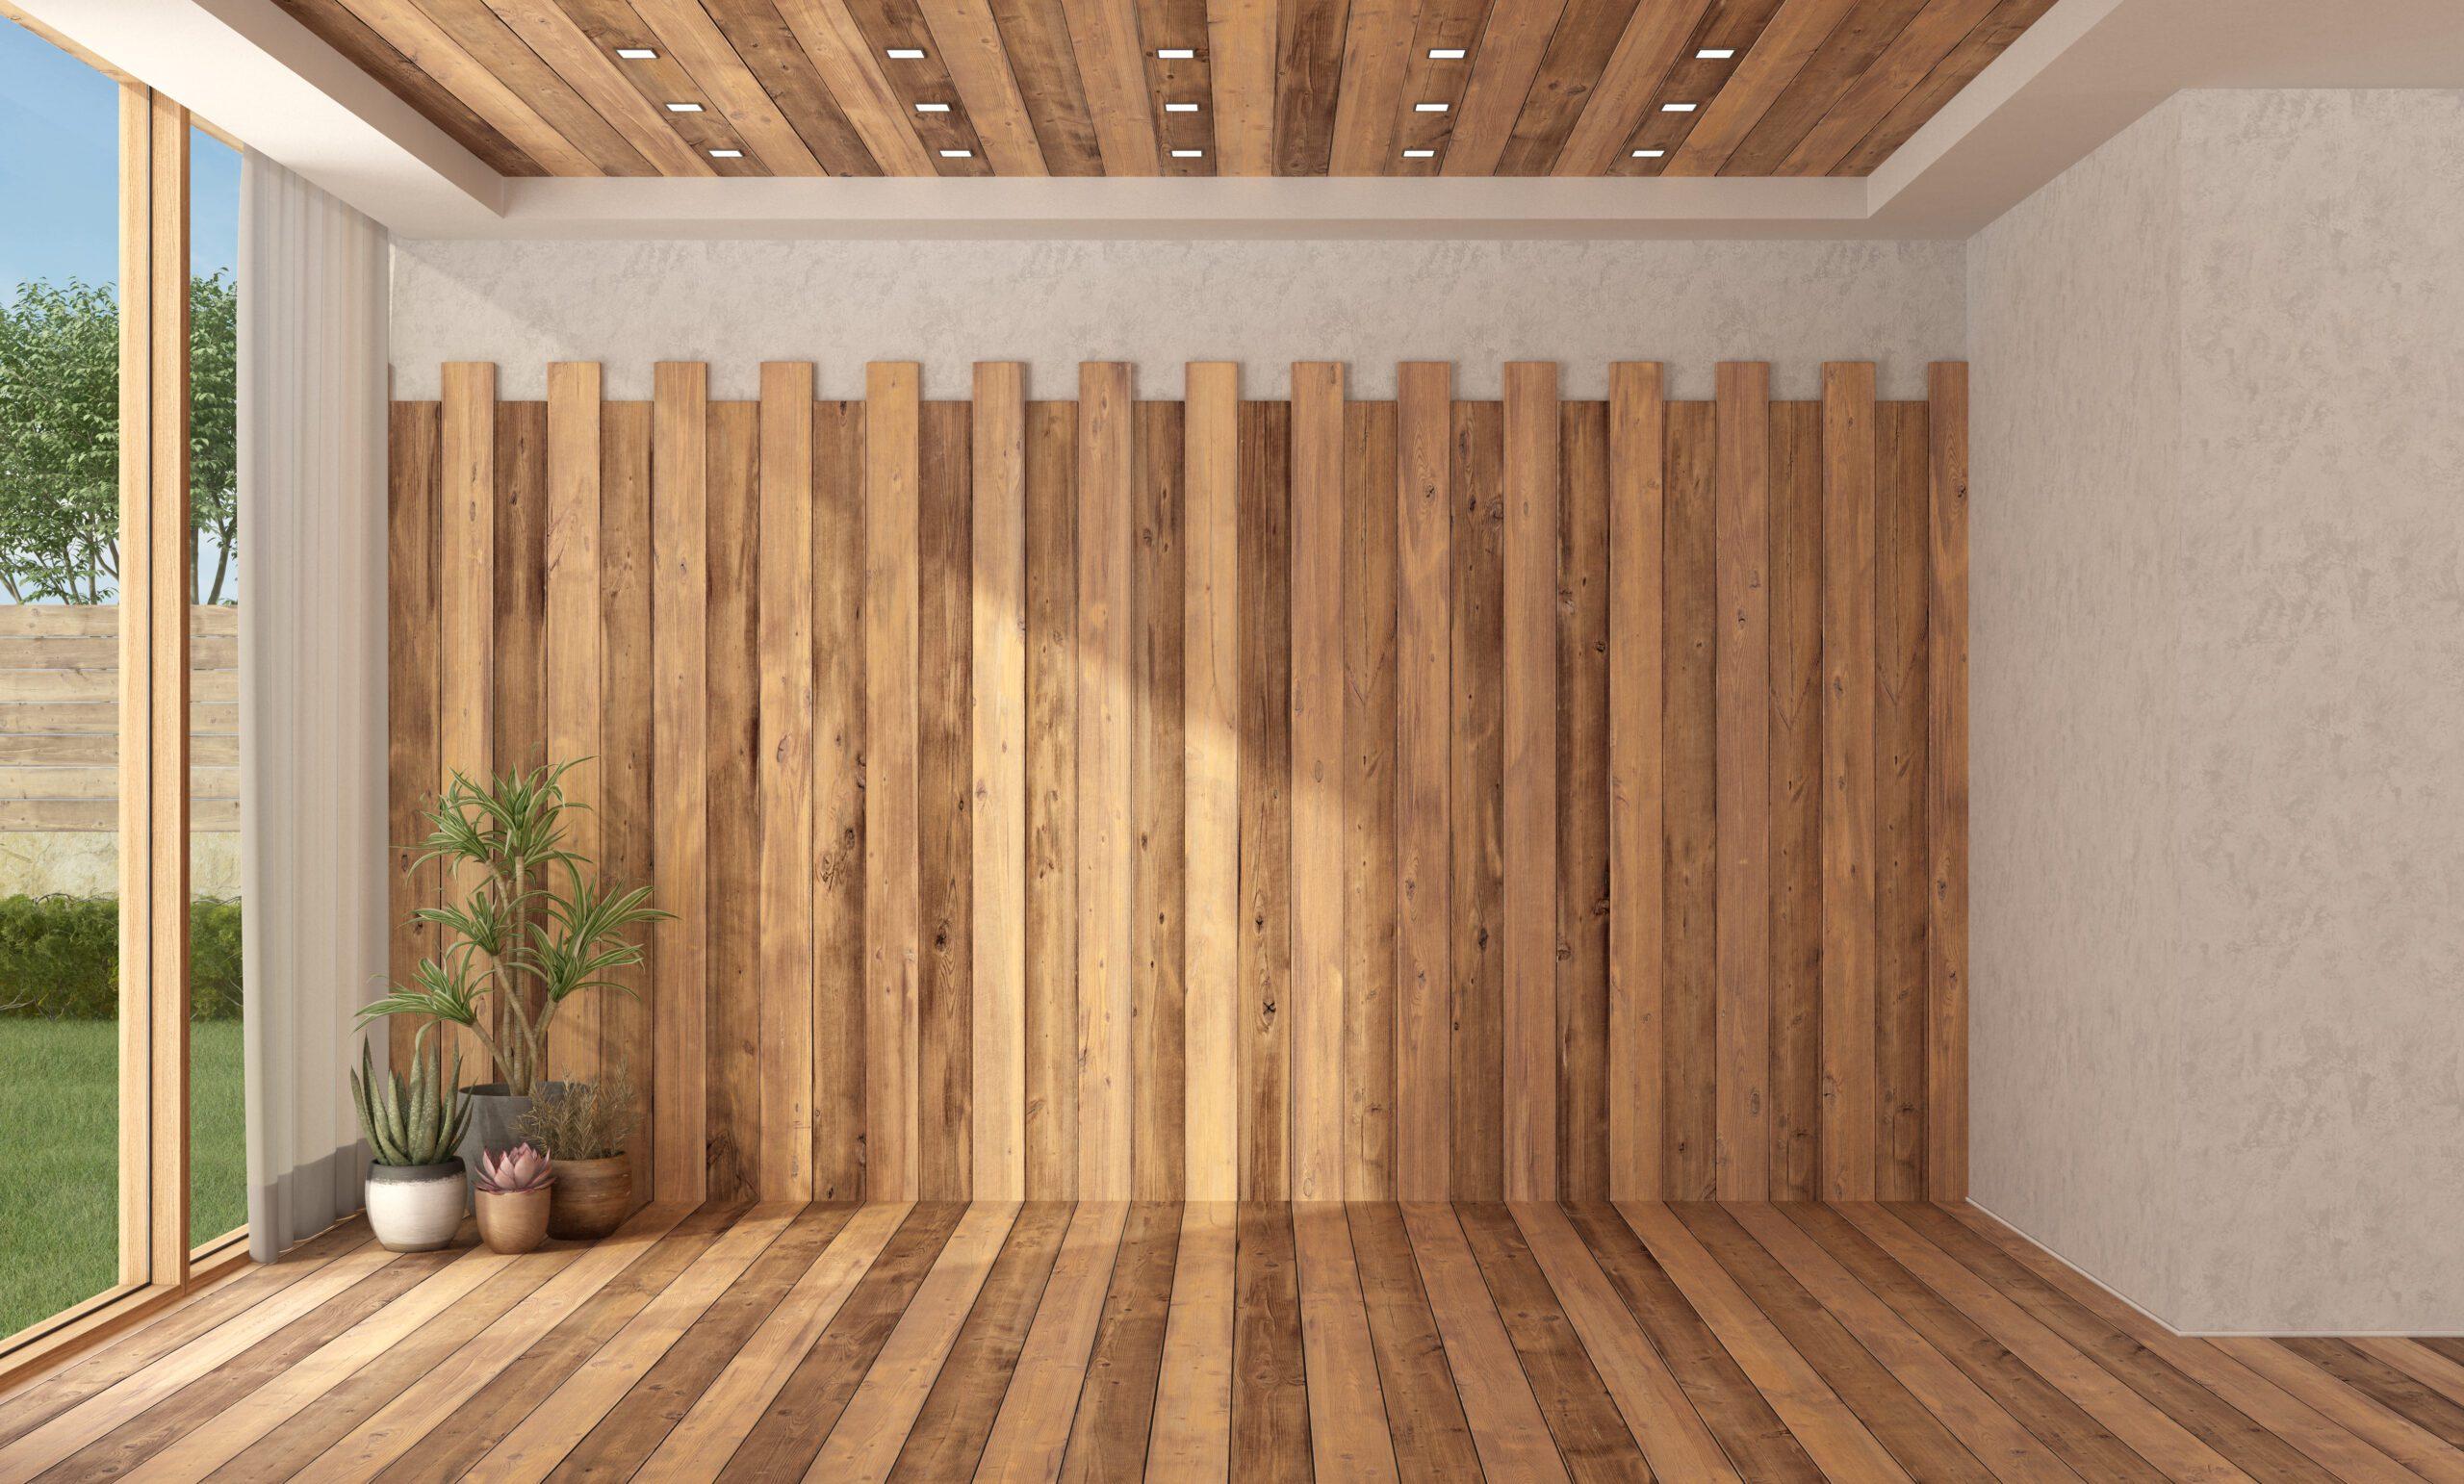 The Showdown Wood Flooring Vs. Wood Laminate